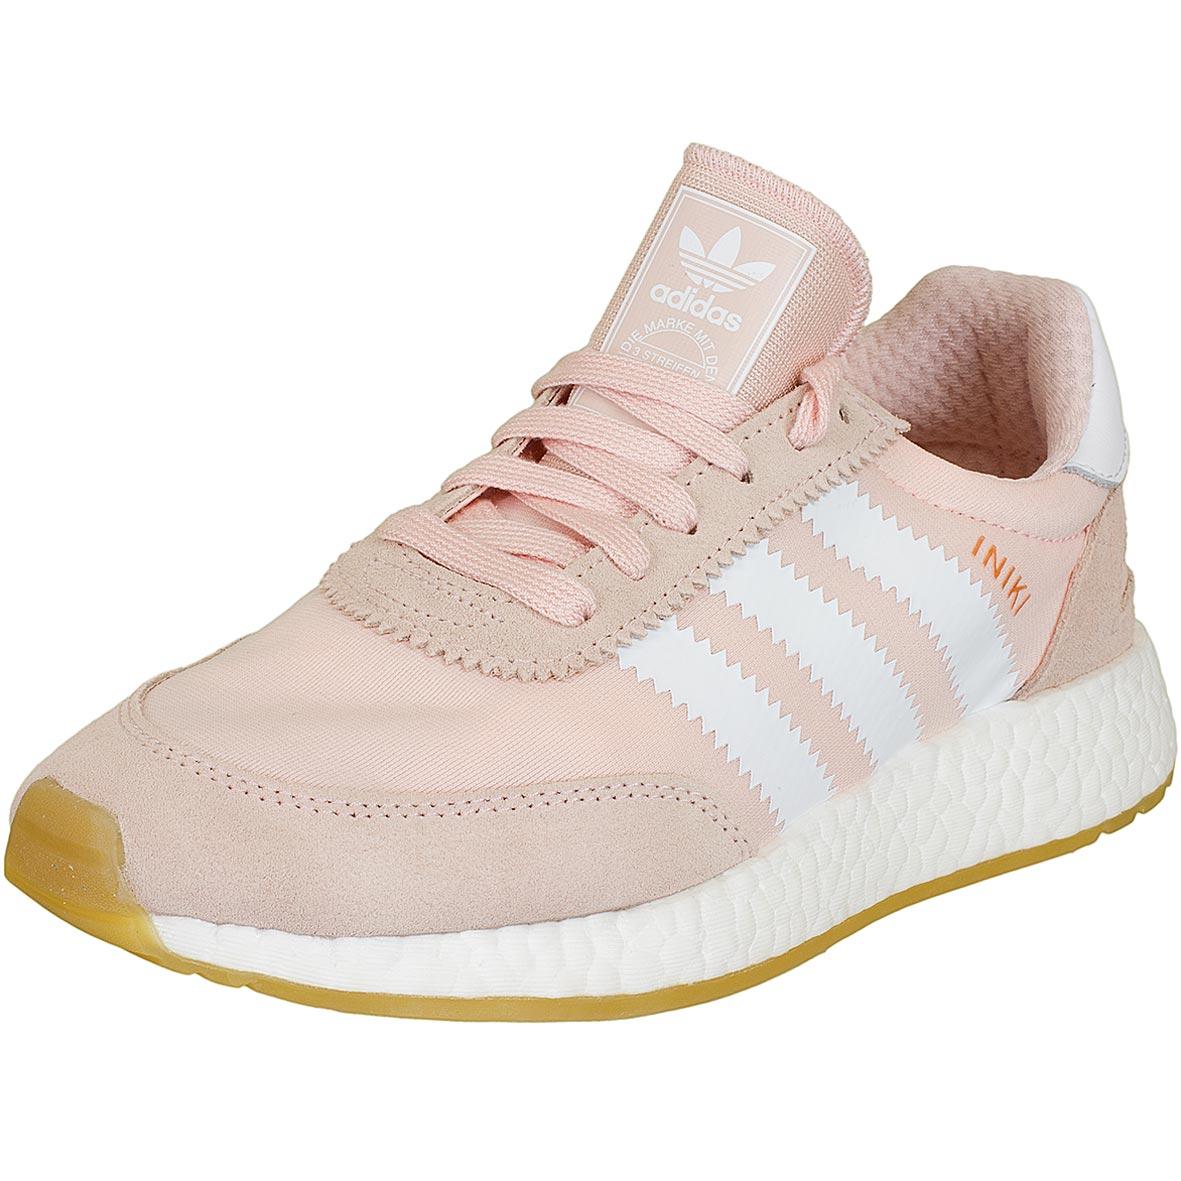 ☆ Adidas Originals Damen Sneaker Iniki Runner pinkweiß